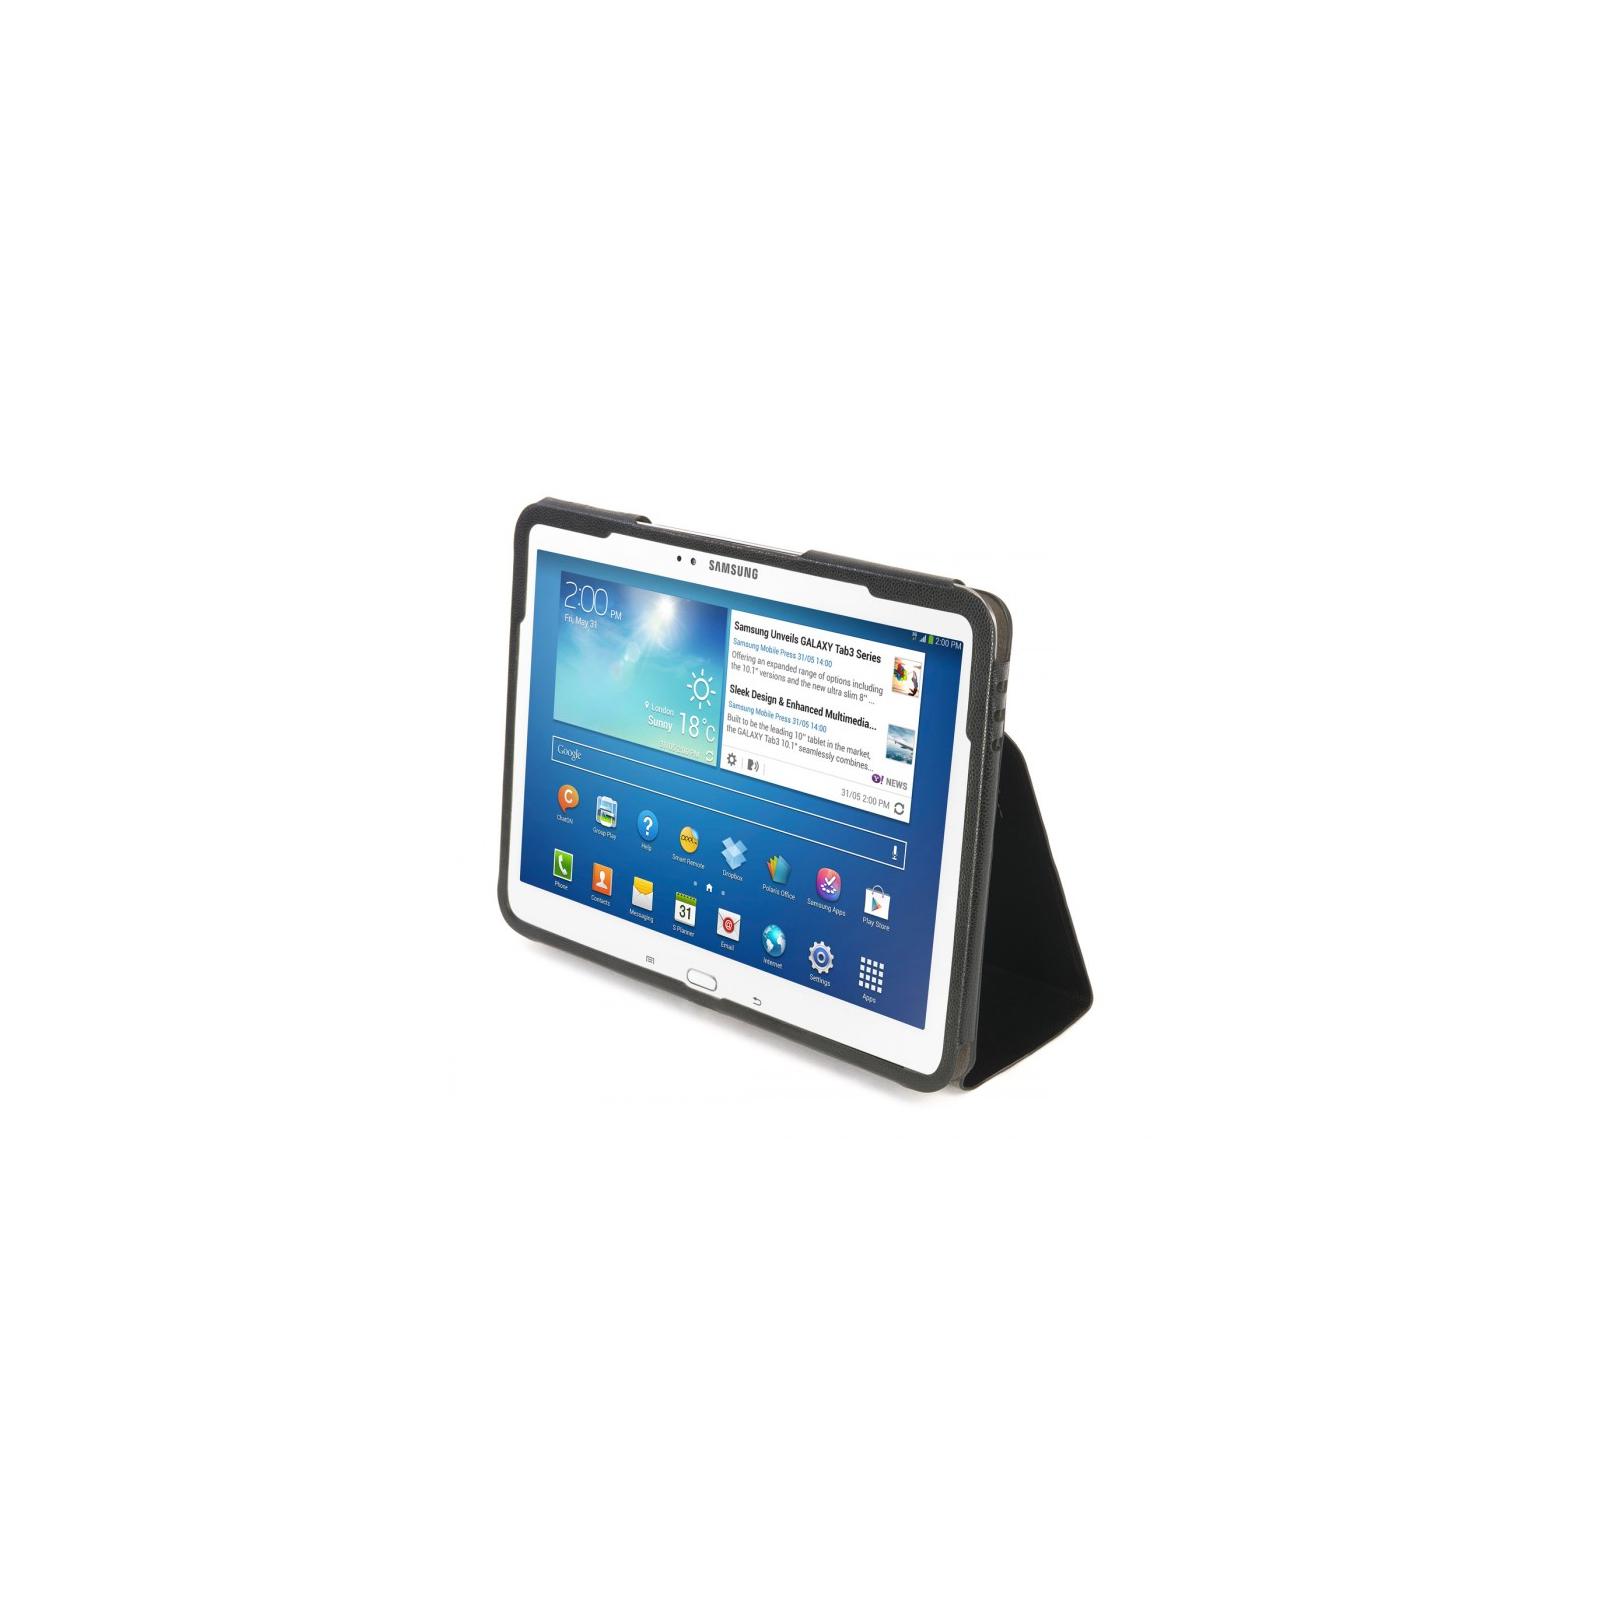 Чехол для планшета Tucano Galaxy Tab 3 10.1 Leggero Black (TAB-LS310) изображение 4